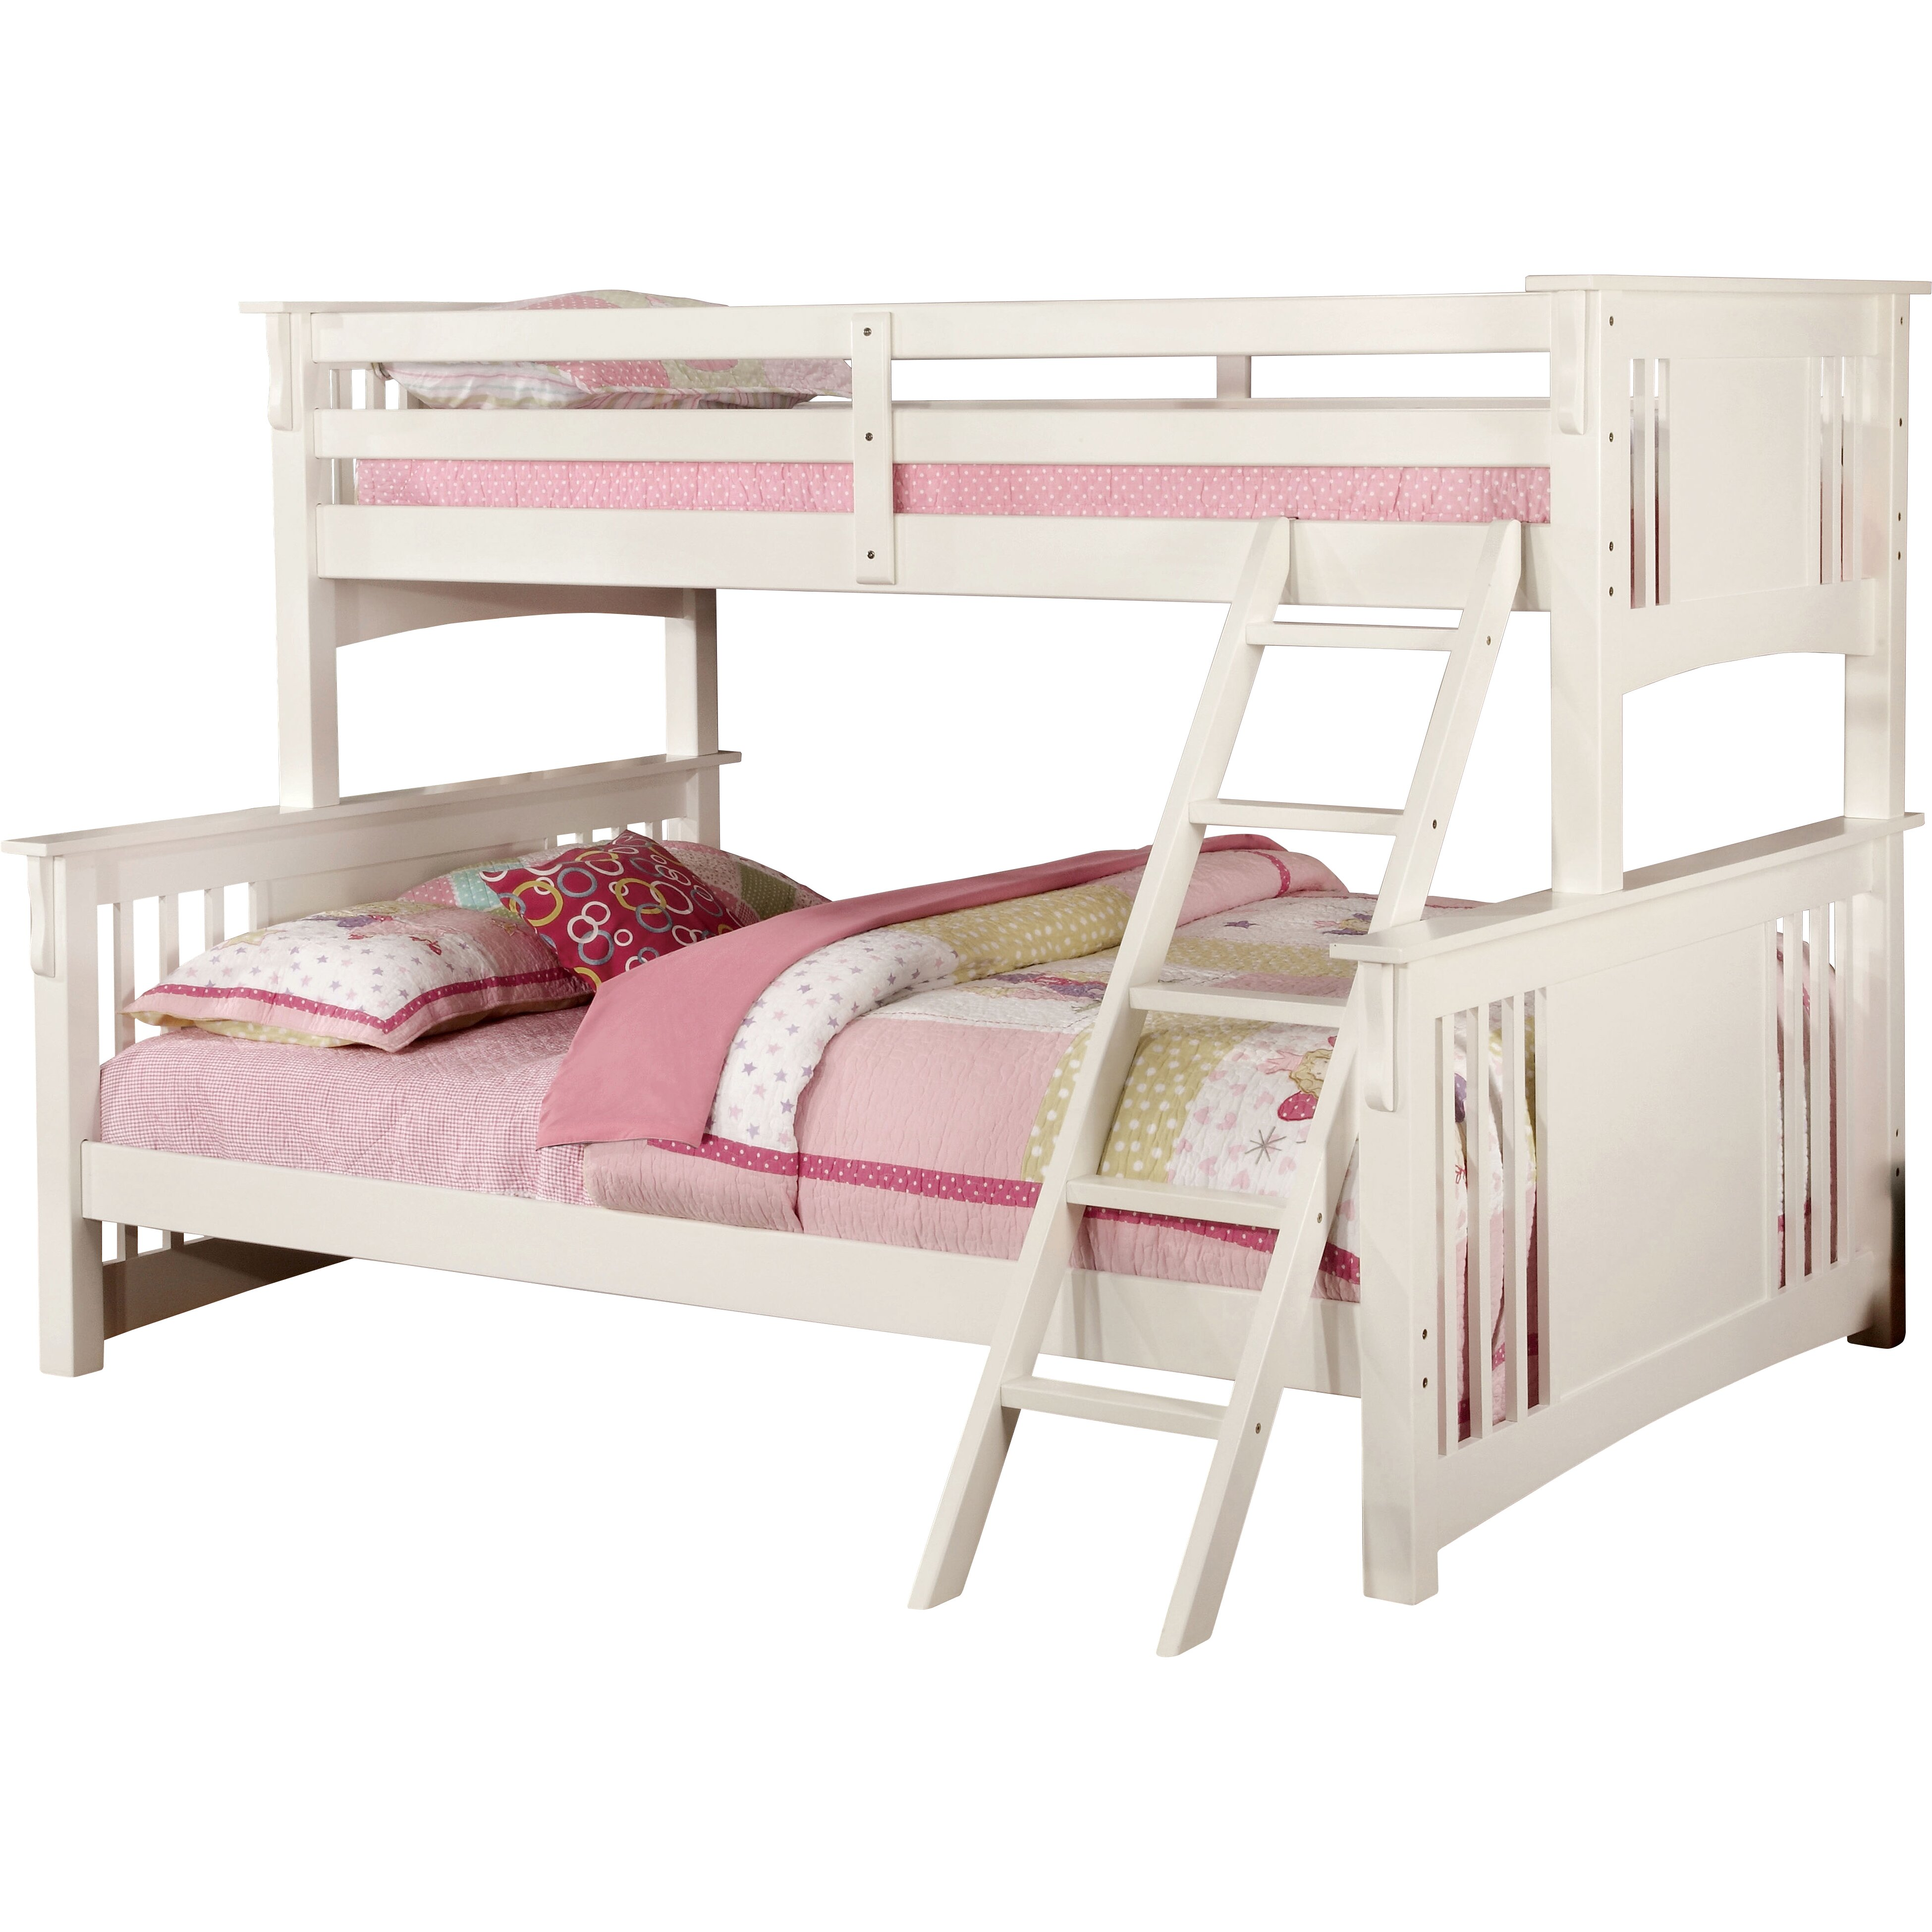 hokku designs spring twin over queen futon bunk bed reviews wayfair. Black Bedroom Furniture Sets. Home Design Ideas